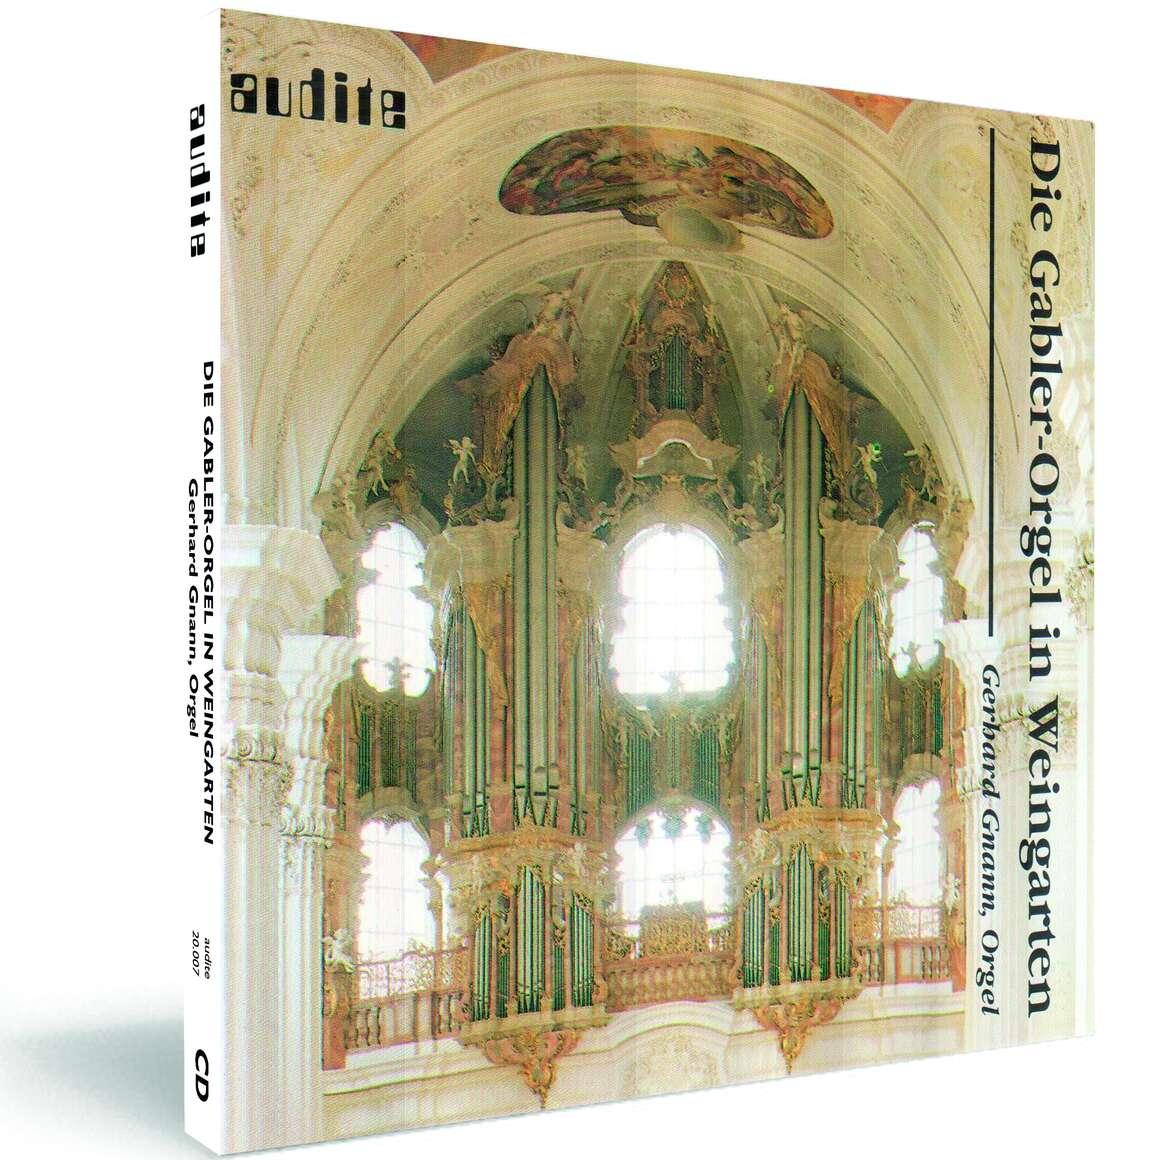 The Gabler-Organ in the Basilica Weingarten